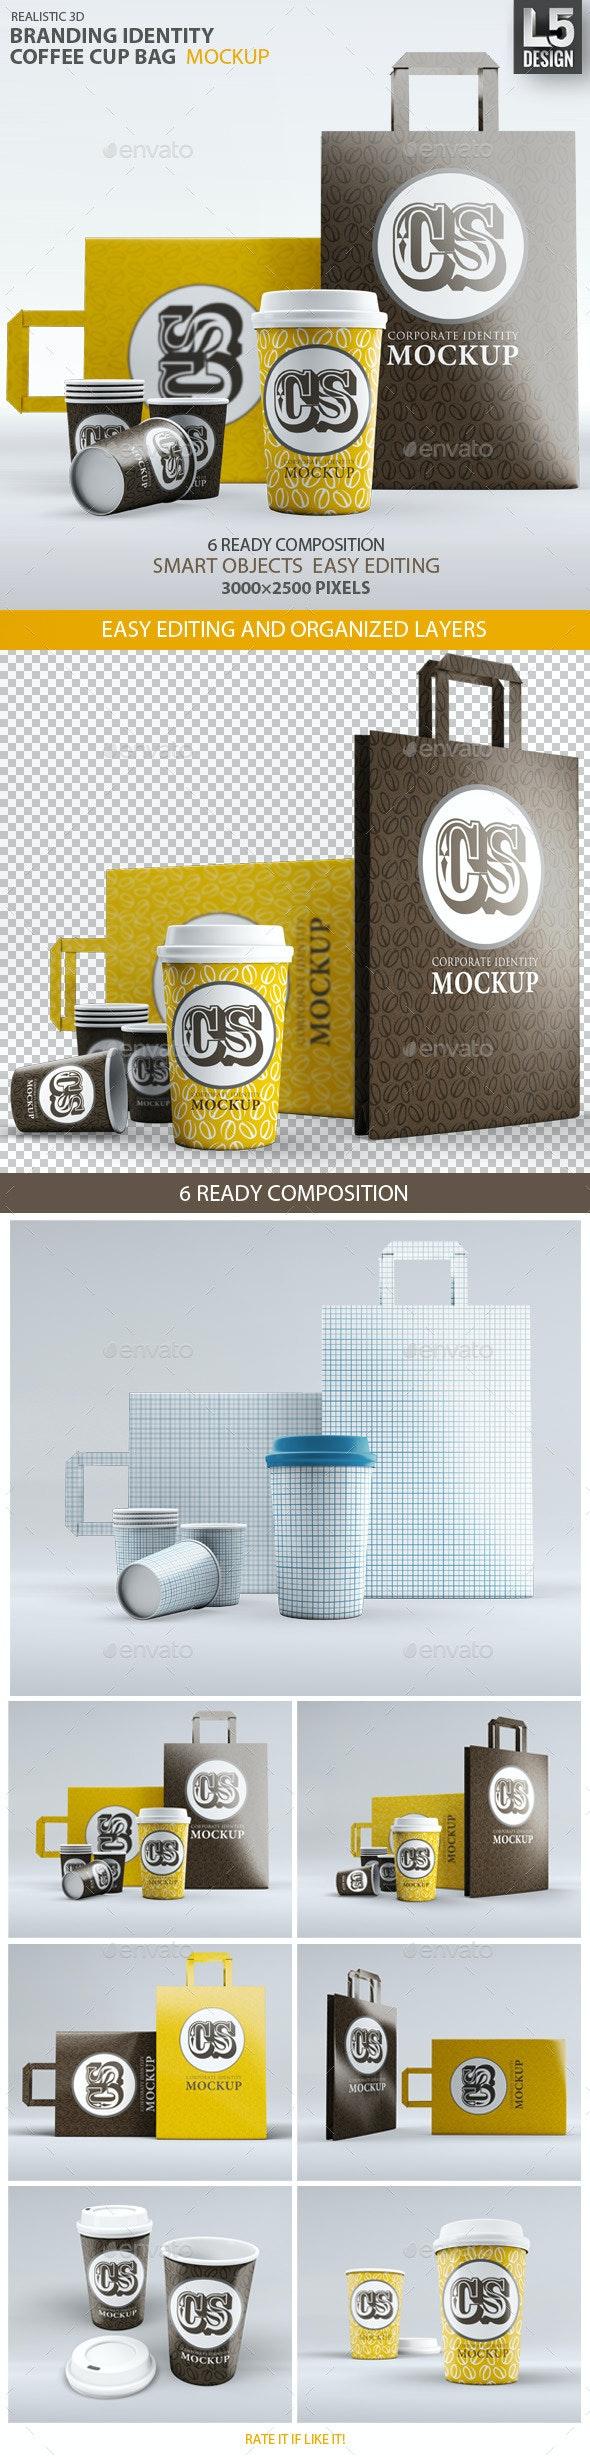 Branding / Identity Coffee Cup Bag Mockup - Food and Drink Packaging